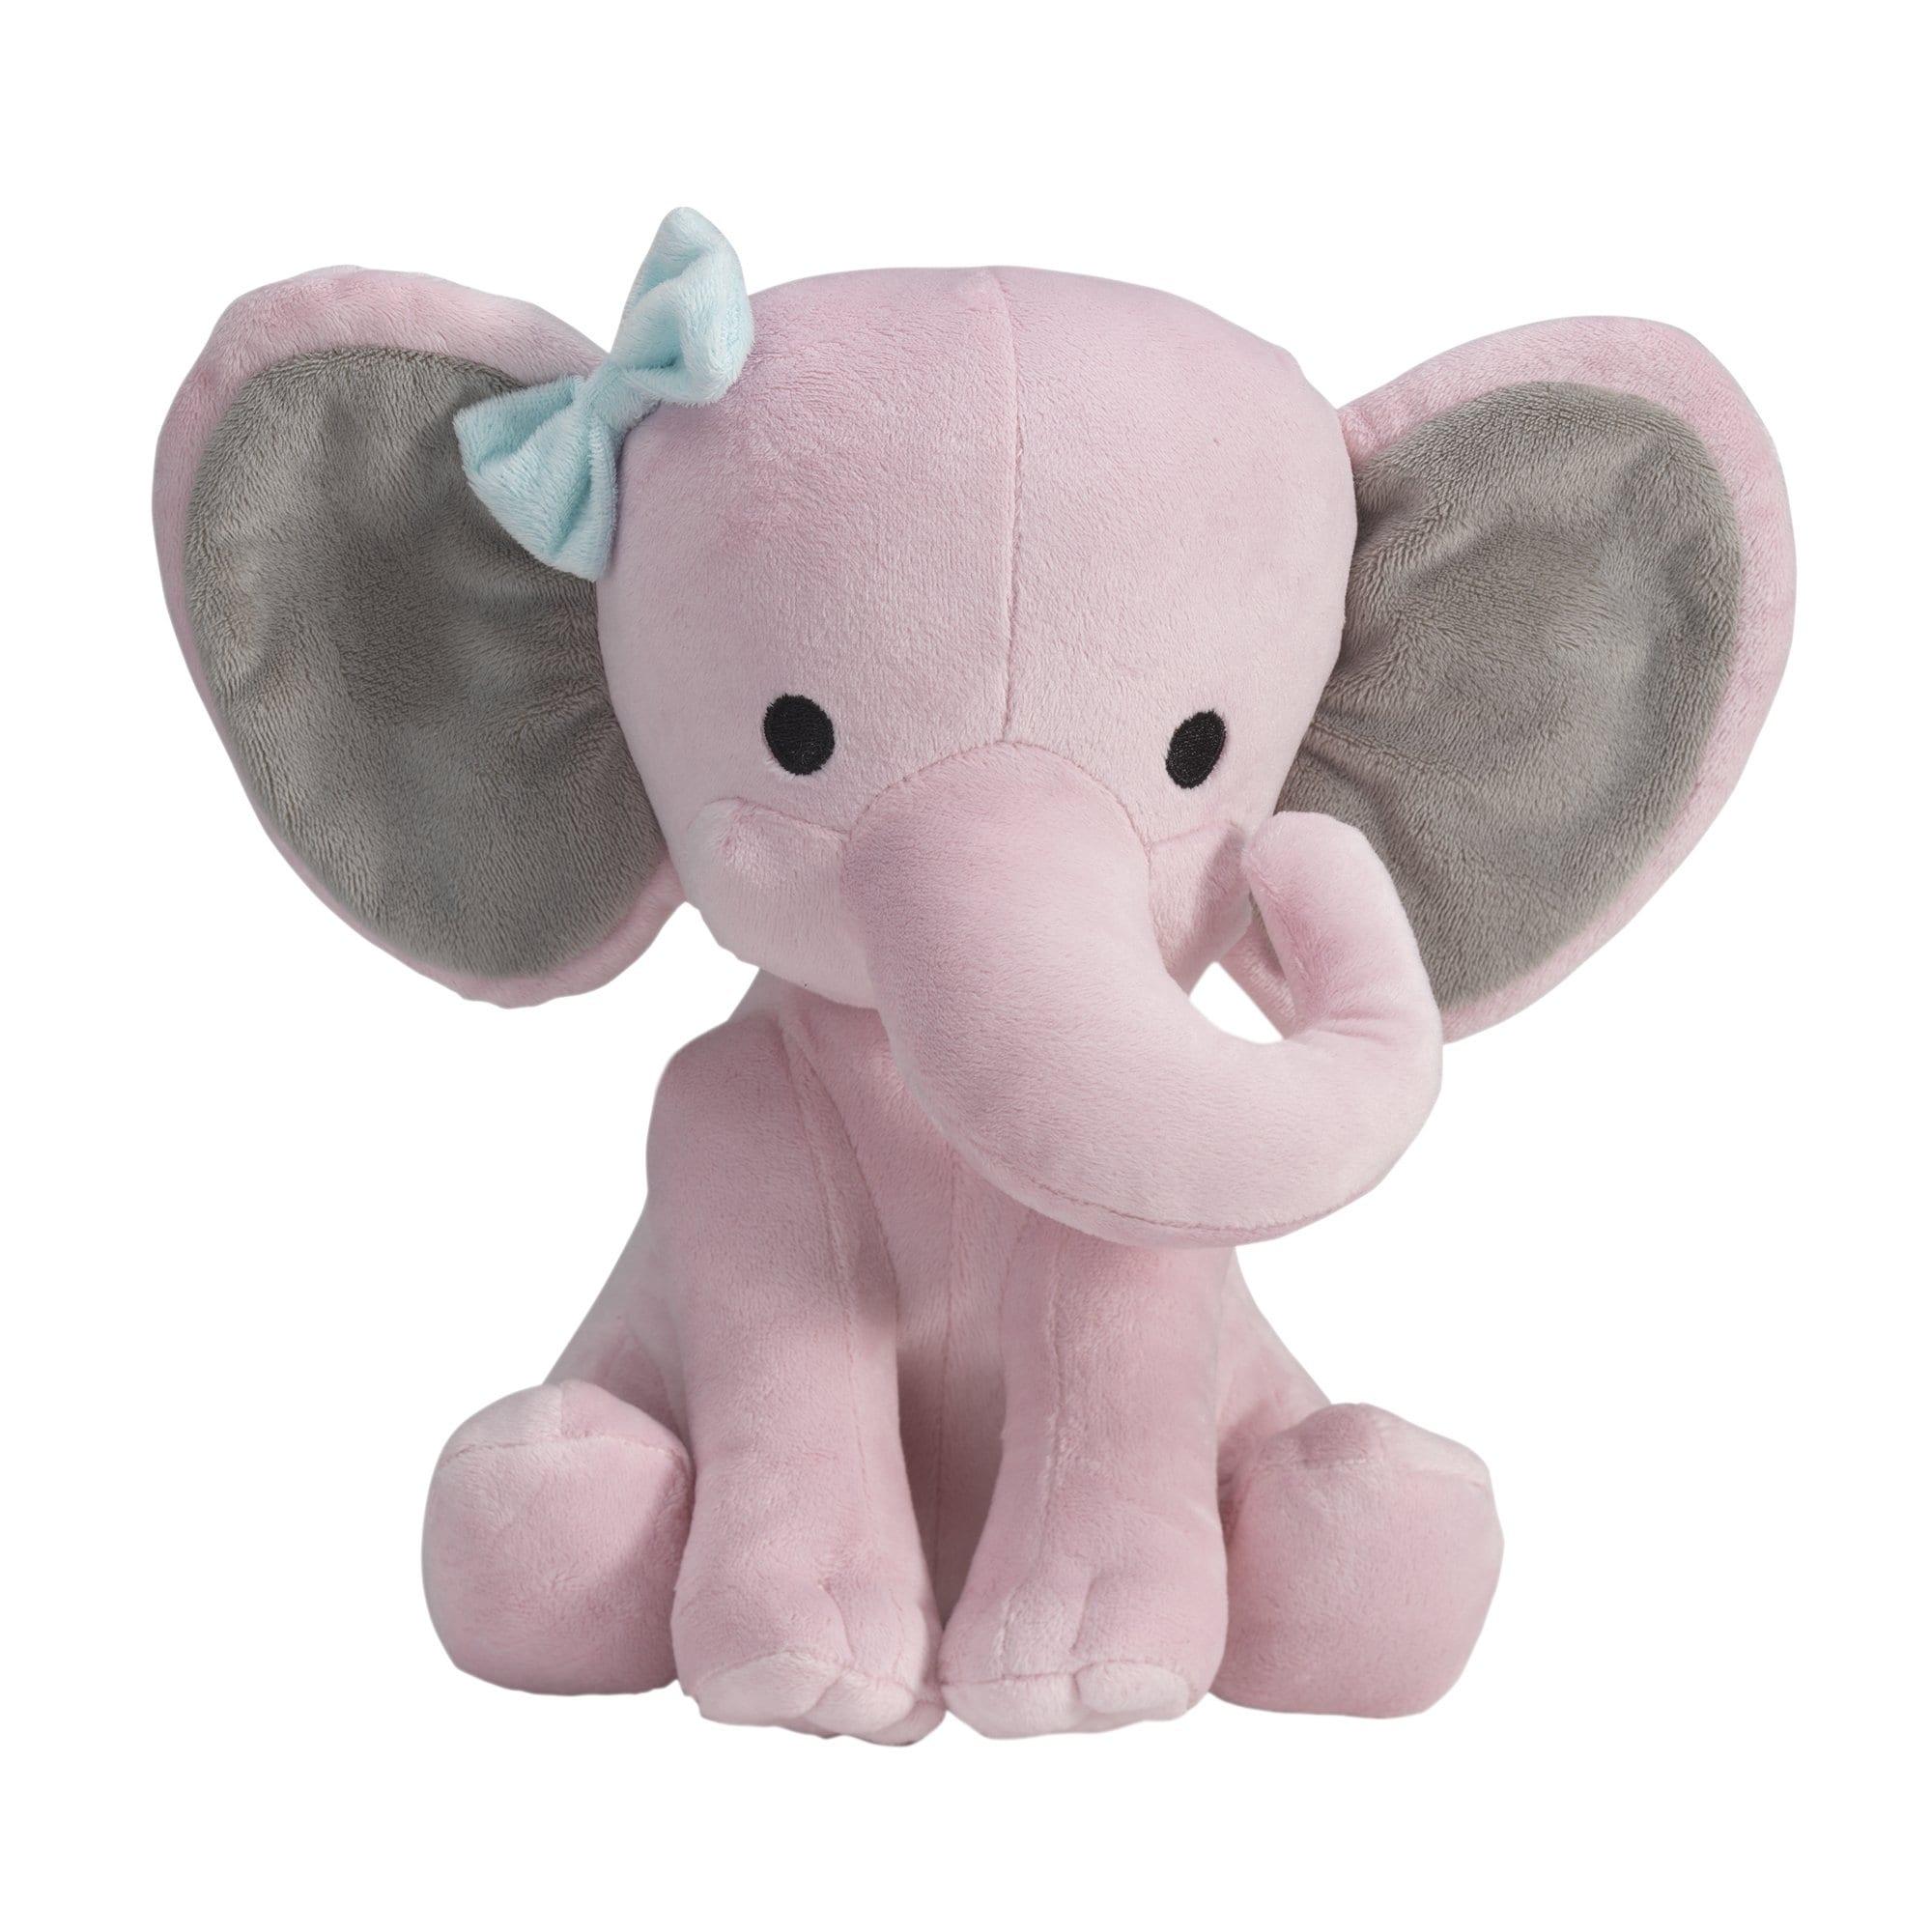 Shop Bedtime Originals Twinkle Toes Pink Gray Plush Elephant Stuffed